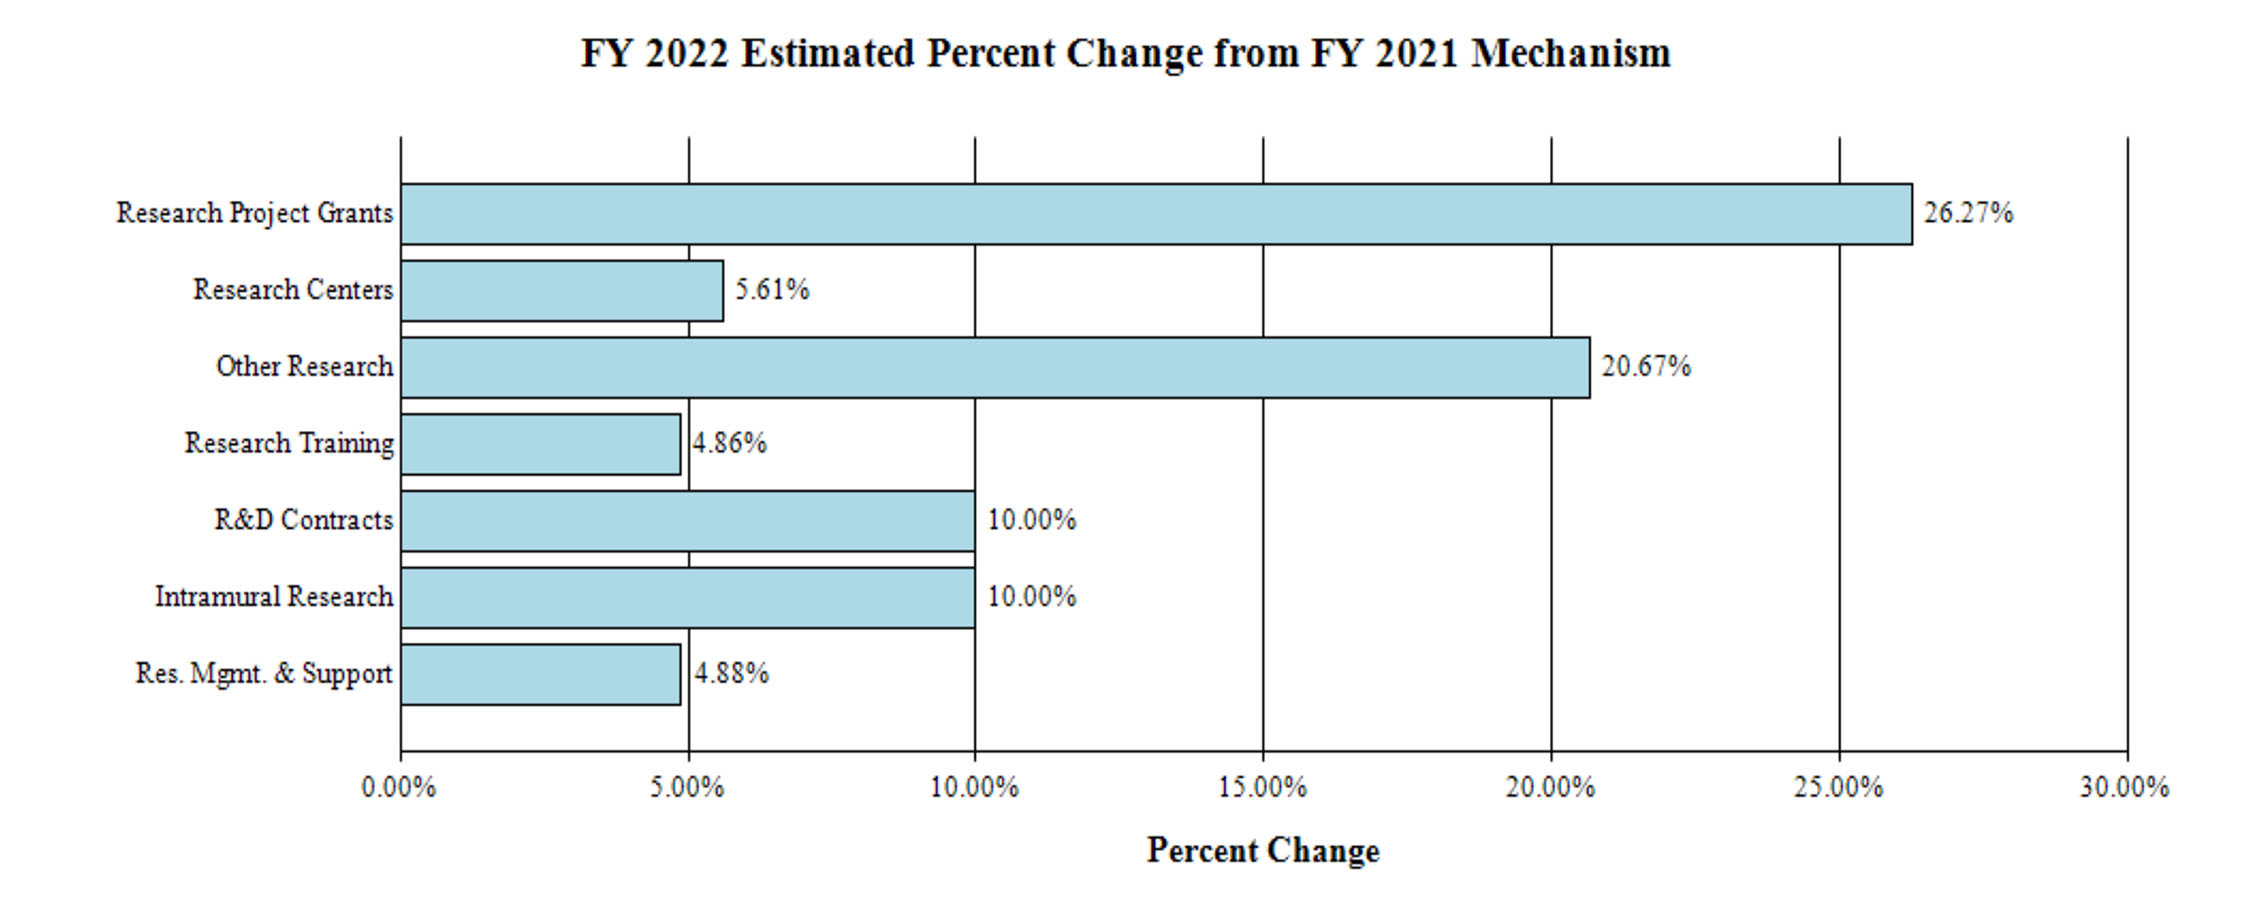 2022 Estimated Percent Change